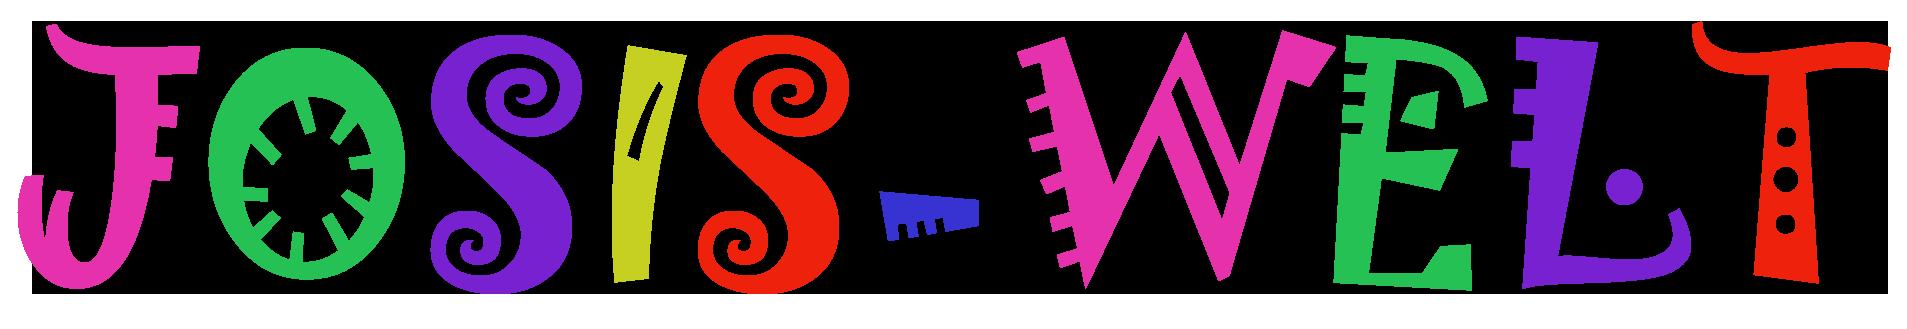 Josis-Welt-Logo